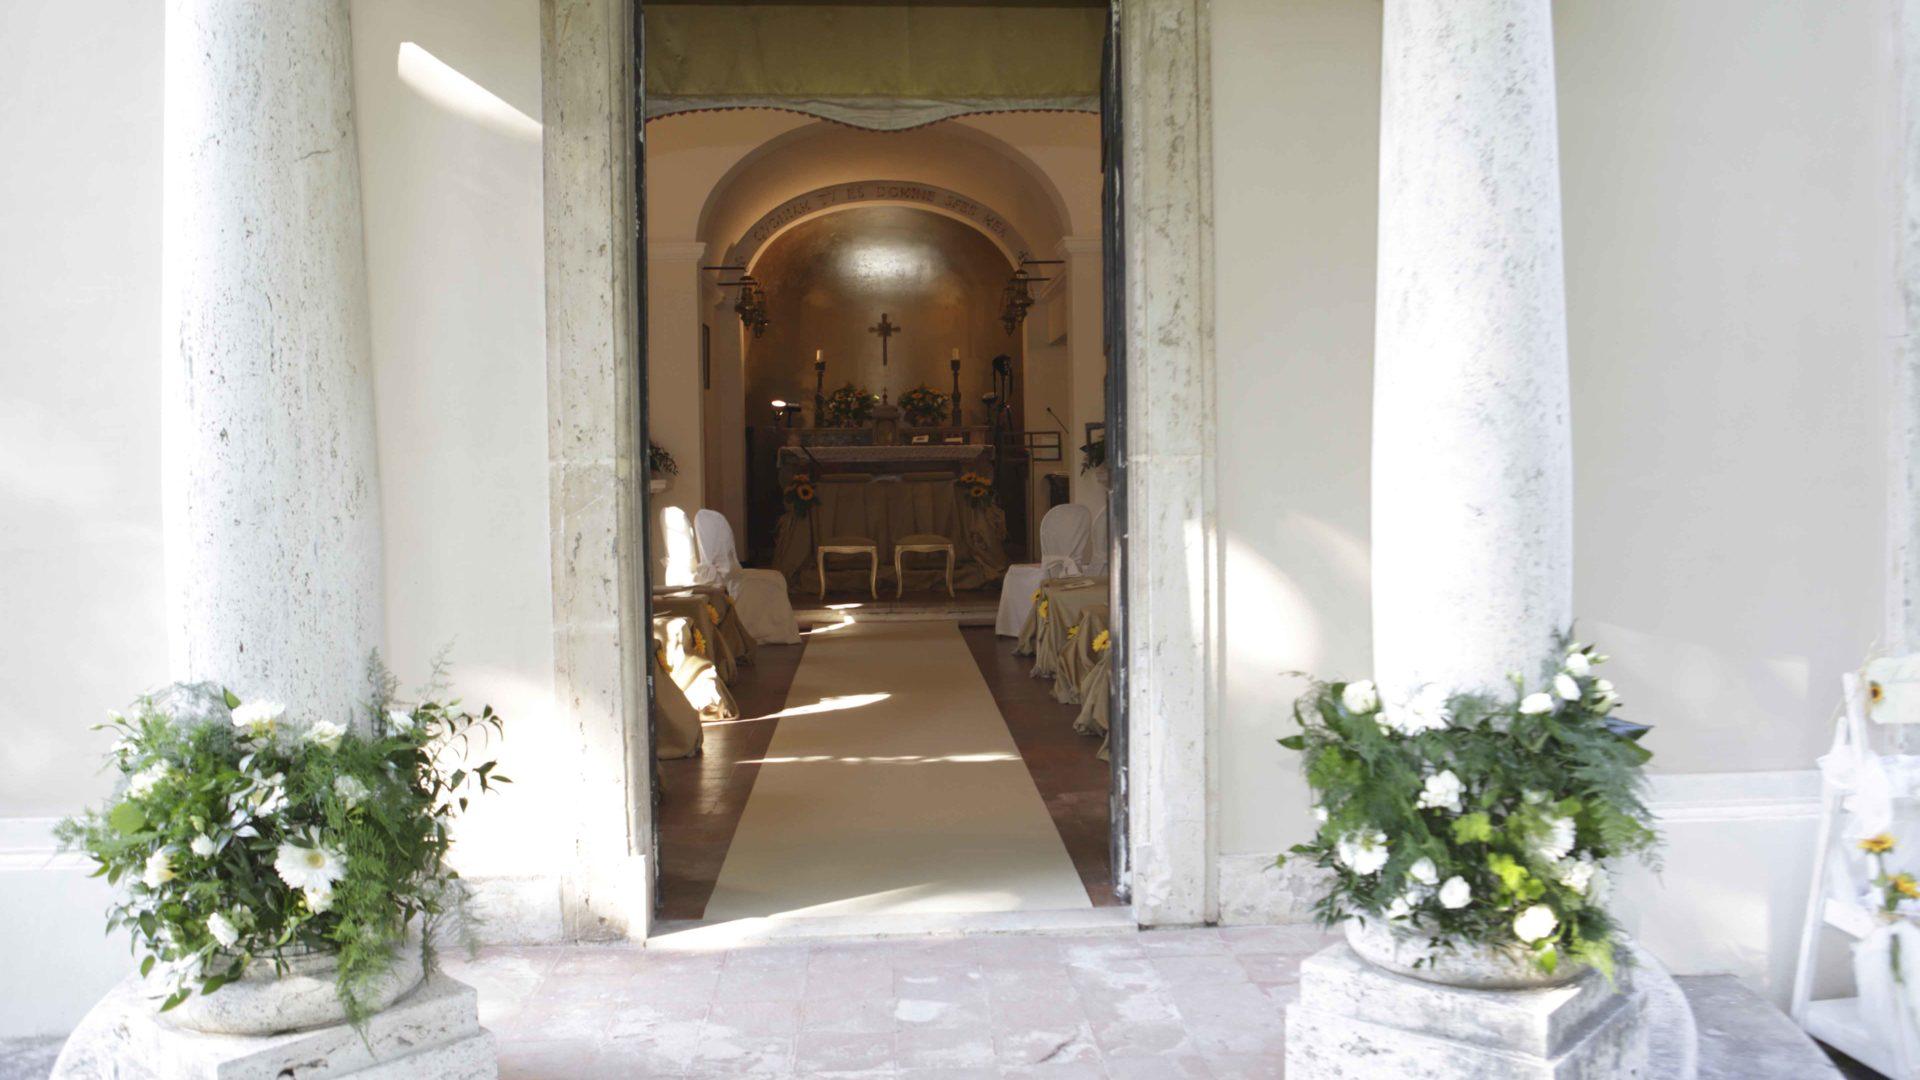 colonne chiesa addobbate